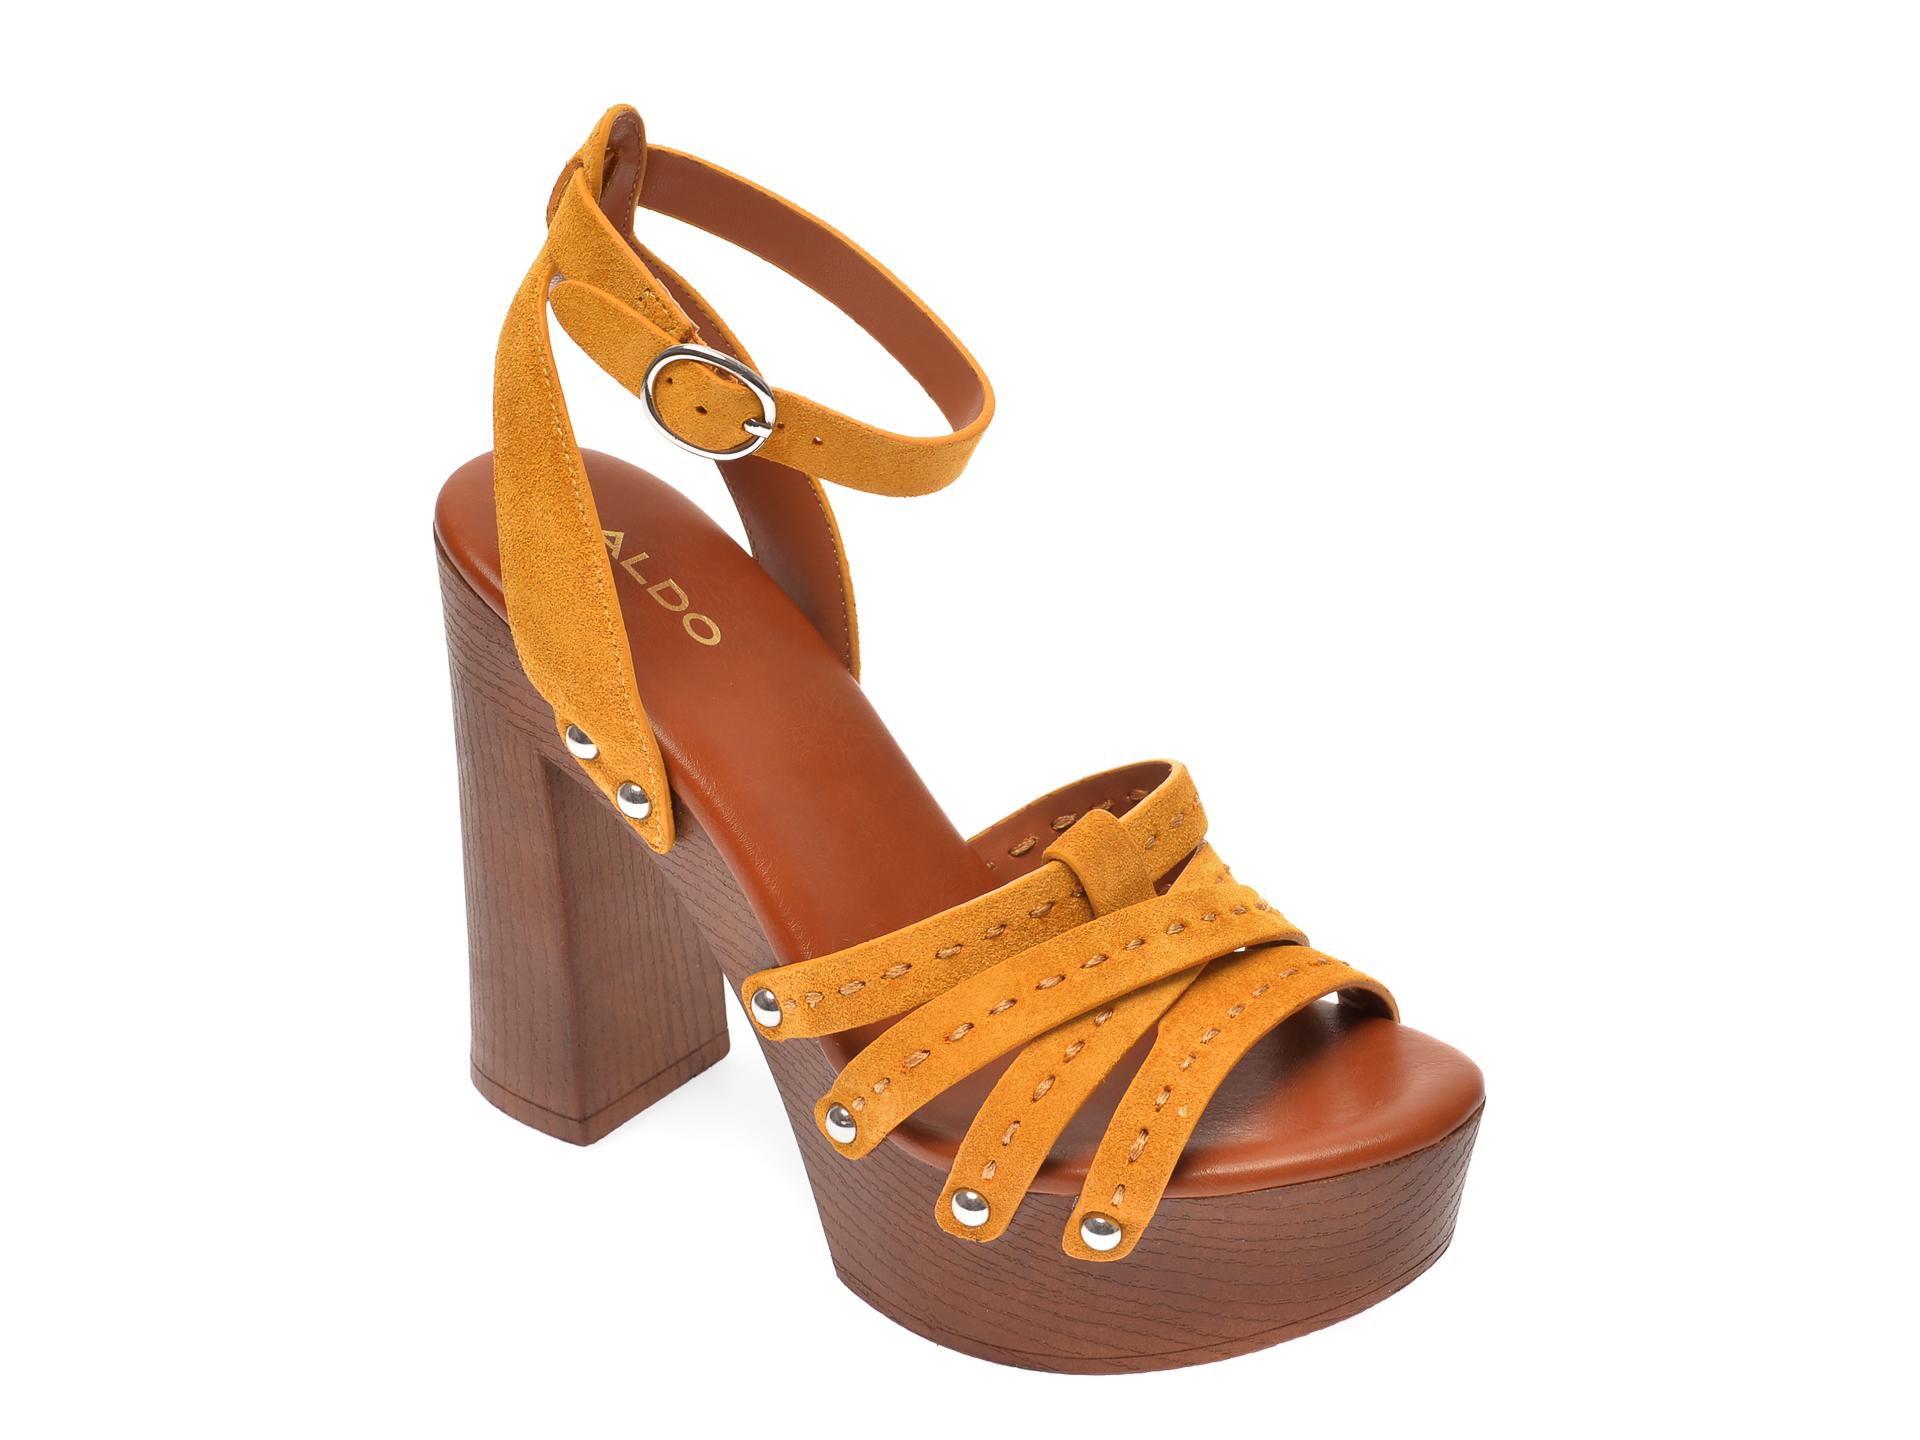 Sandale ALDO galbene, Hendra700, din piele intoarsa imagine otter.ro 2021